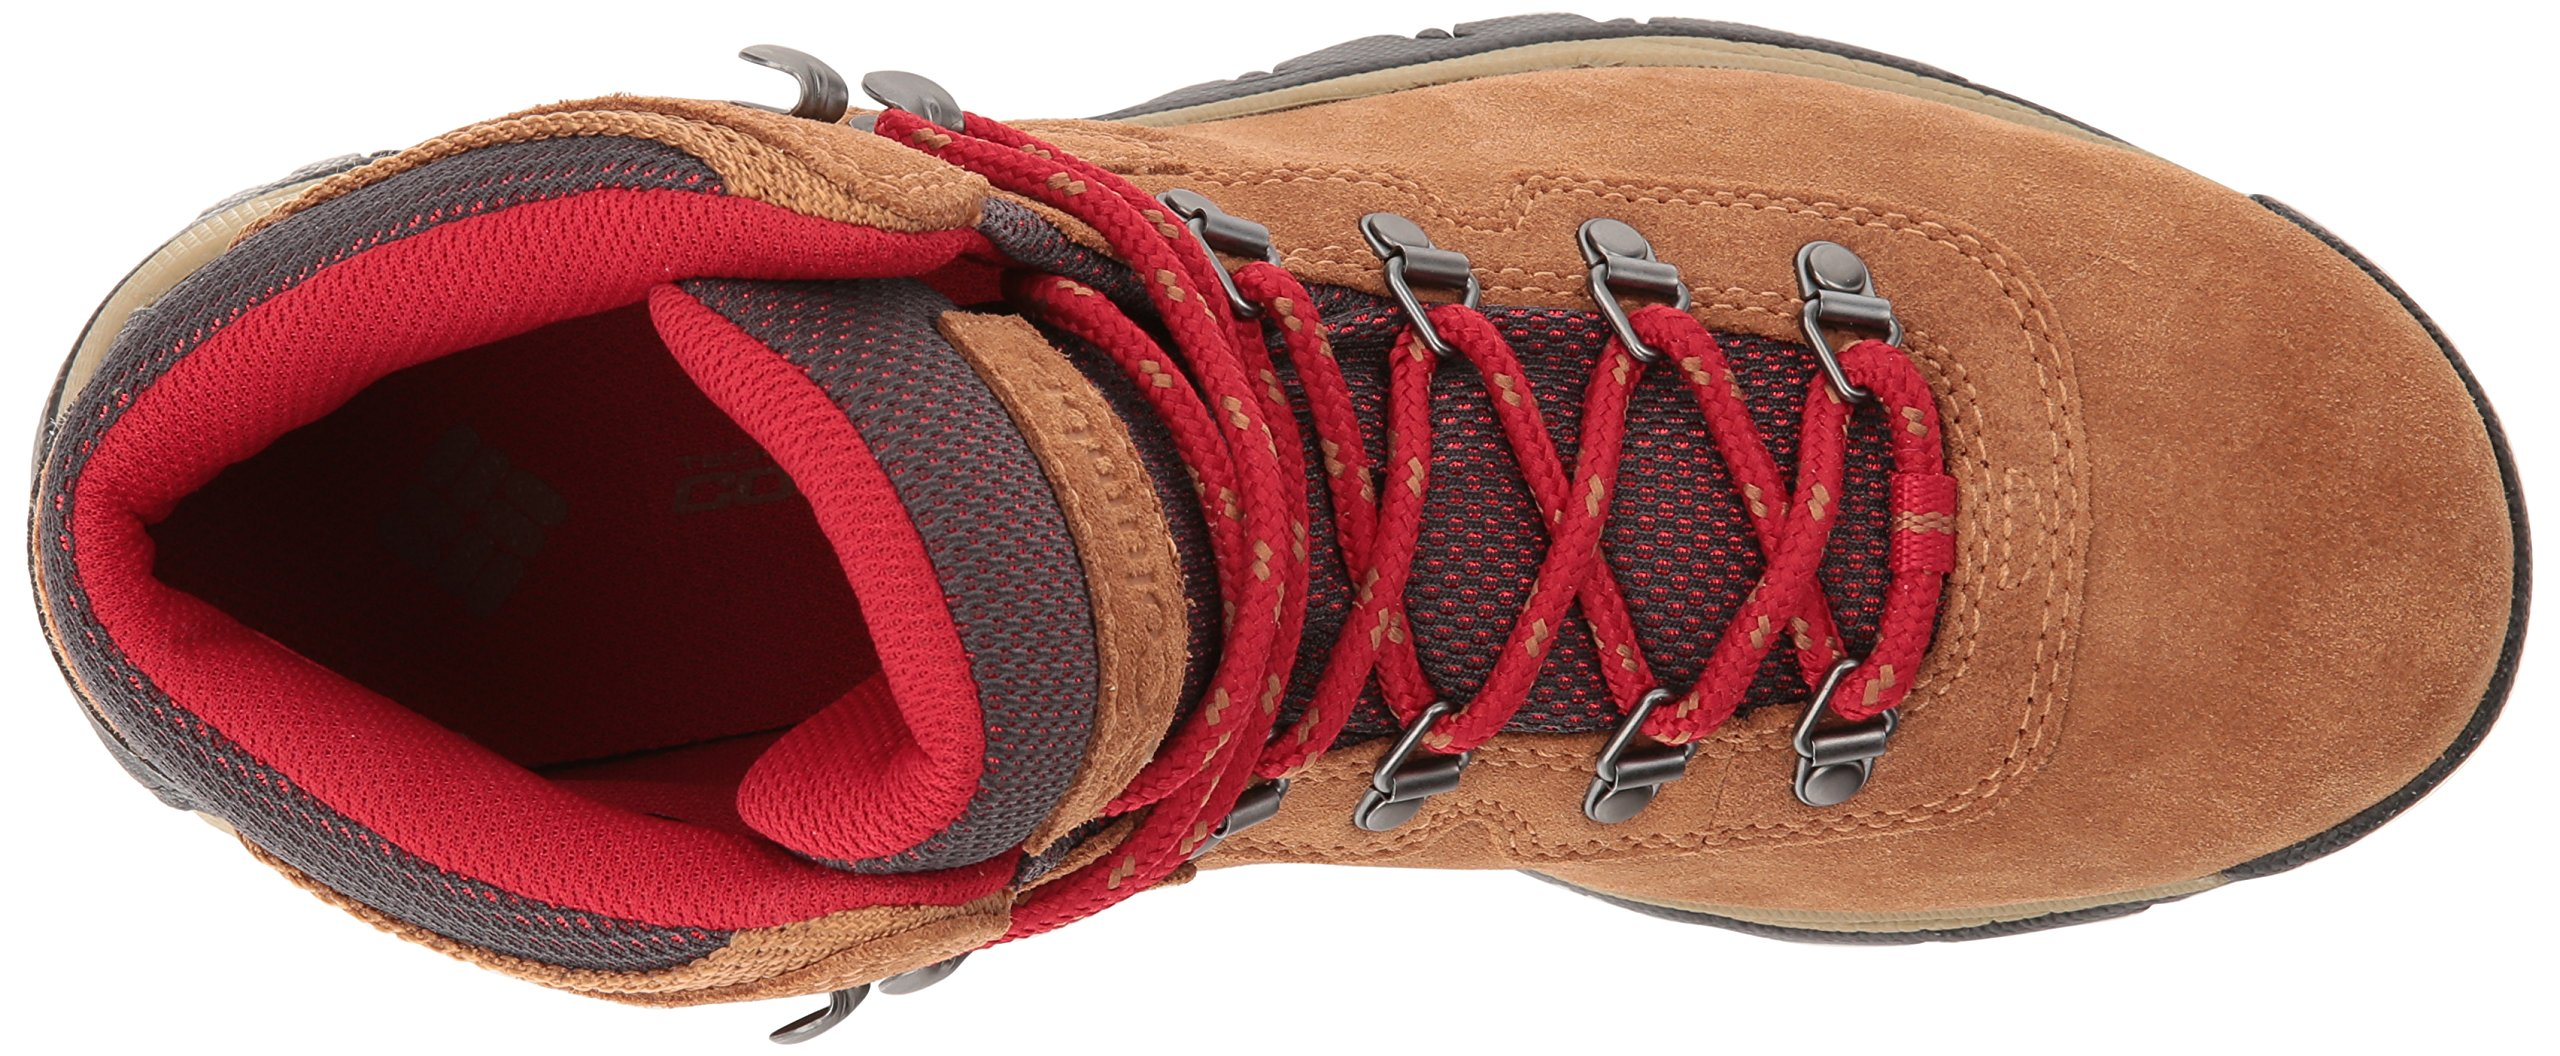 Columbia Women's Newton Ridge Plus Waterproof Amped Hiking Boot, Elk, Mountain Red, 7.5 B US by Columbia (Image #8)